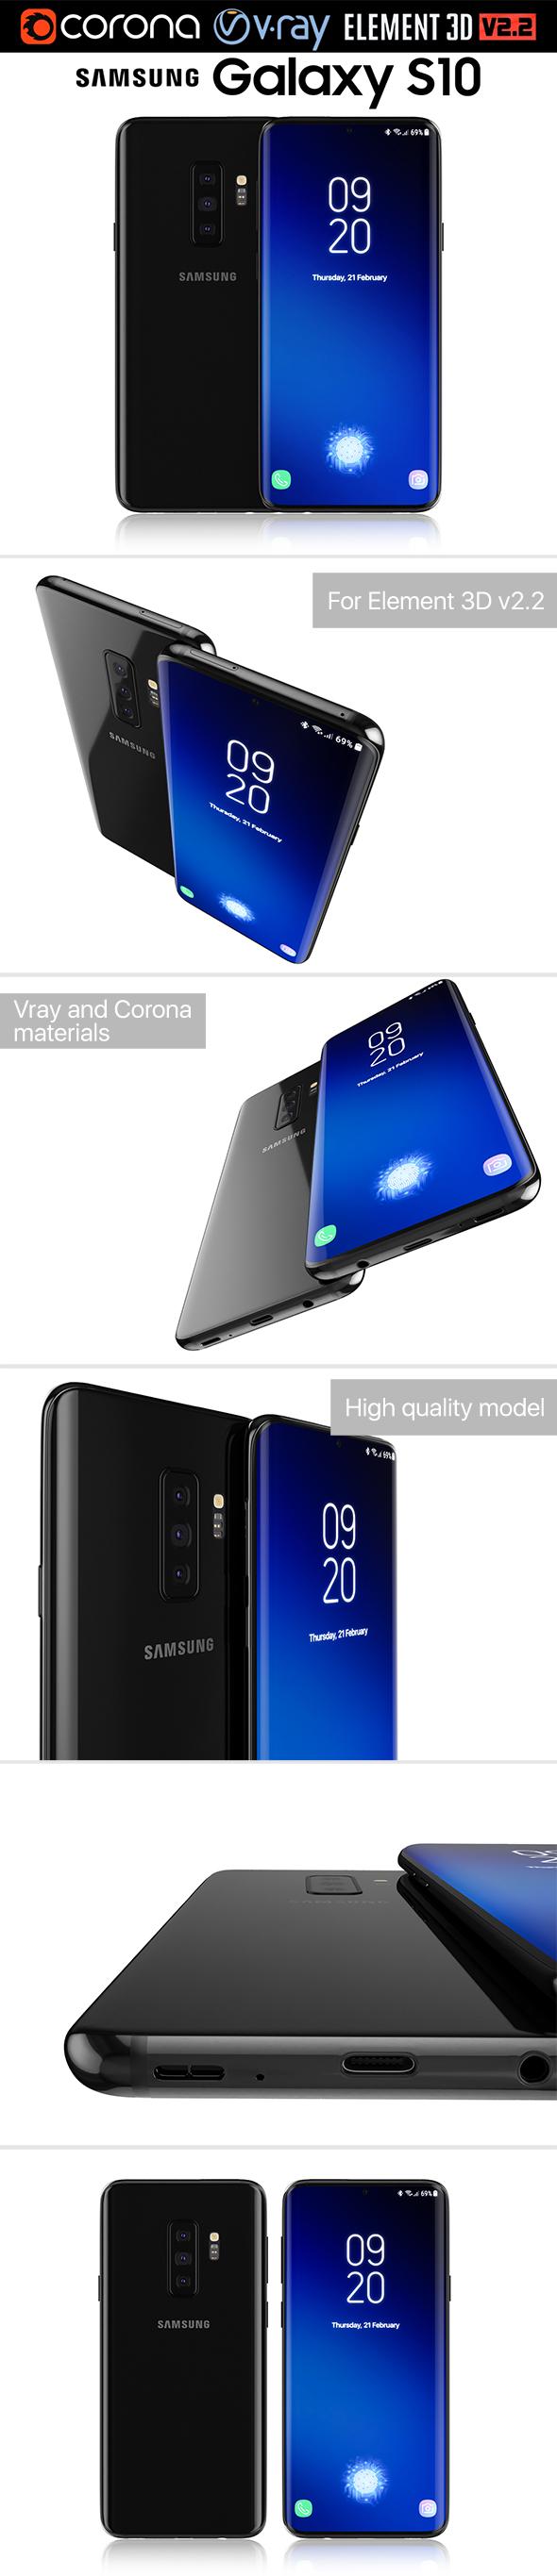 Samsung GALAXY S10 v1 - 3DOcean Item for Sale